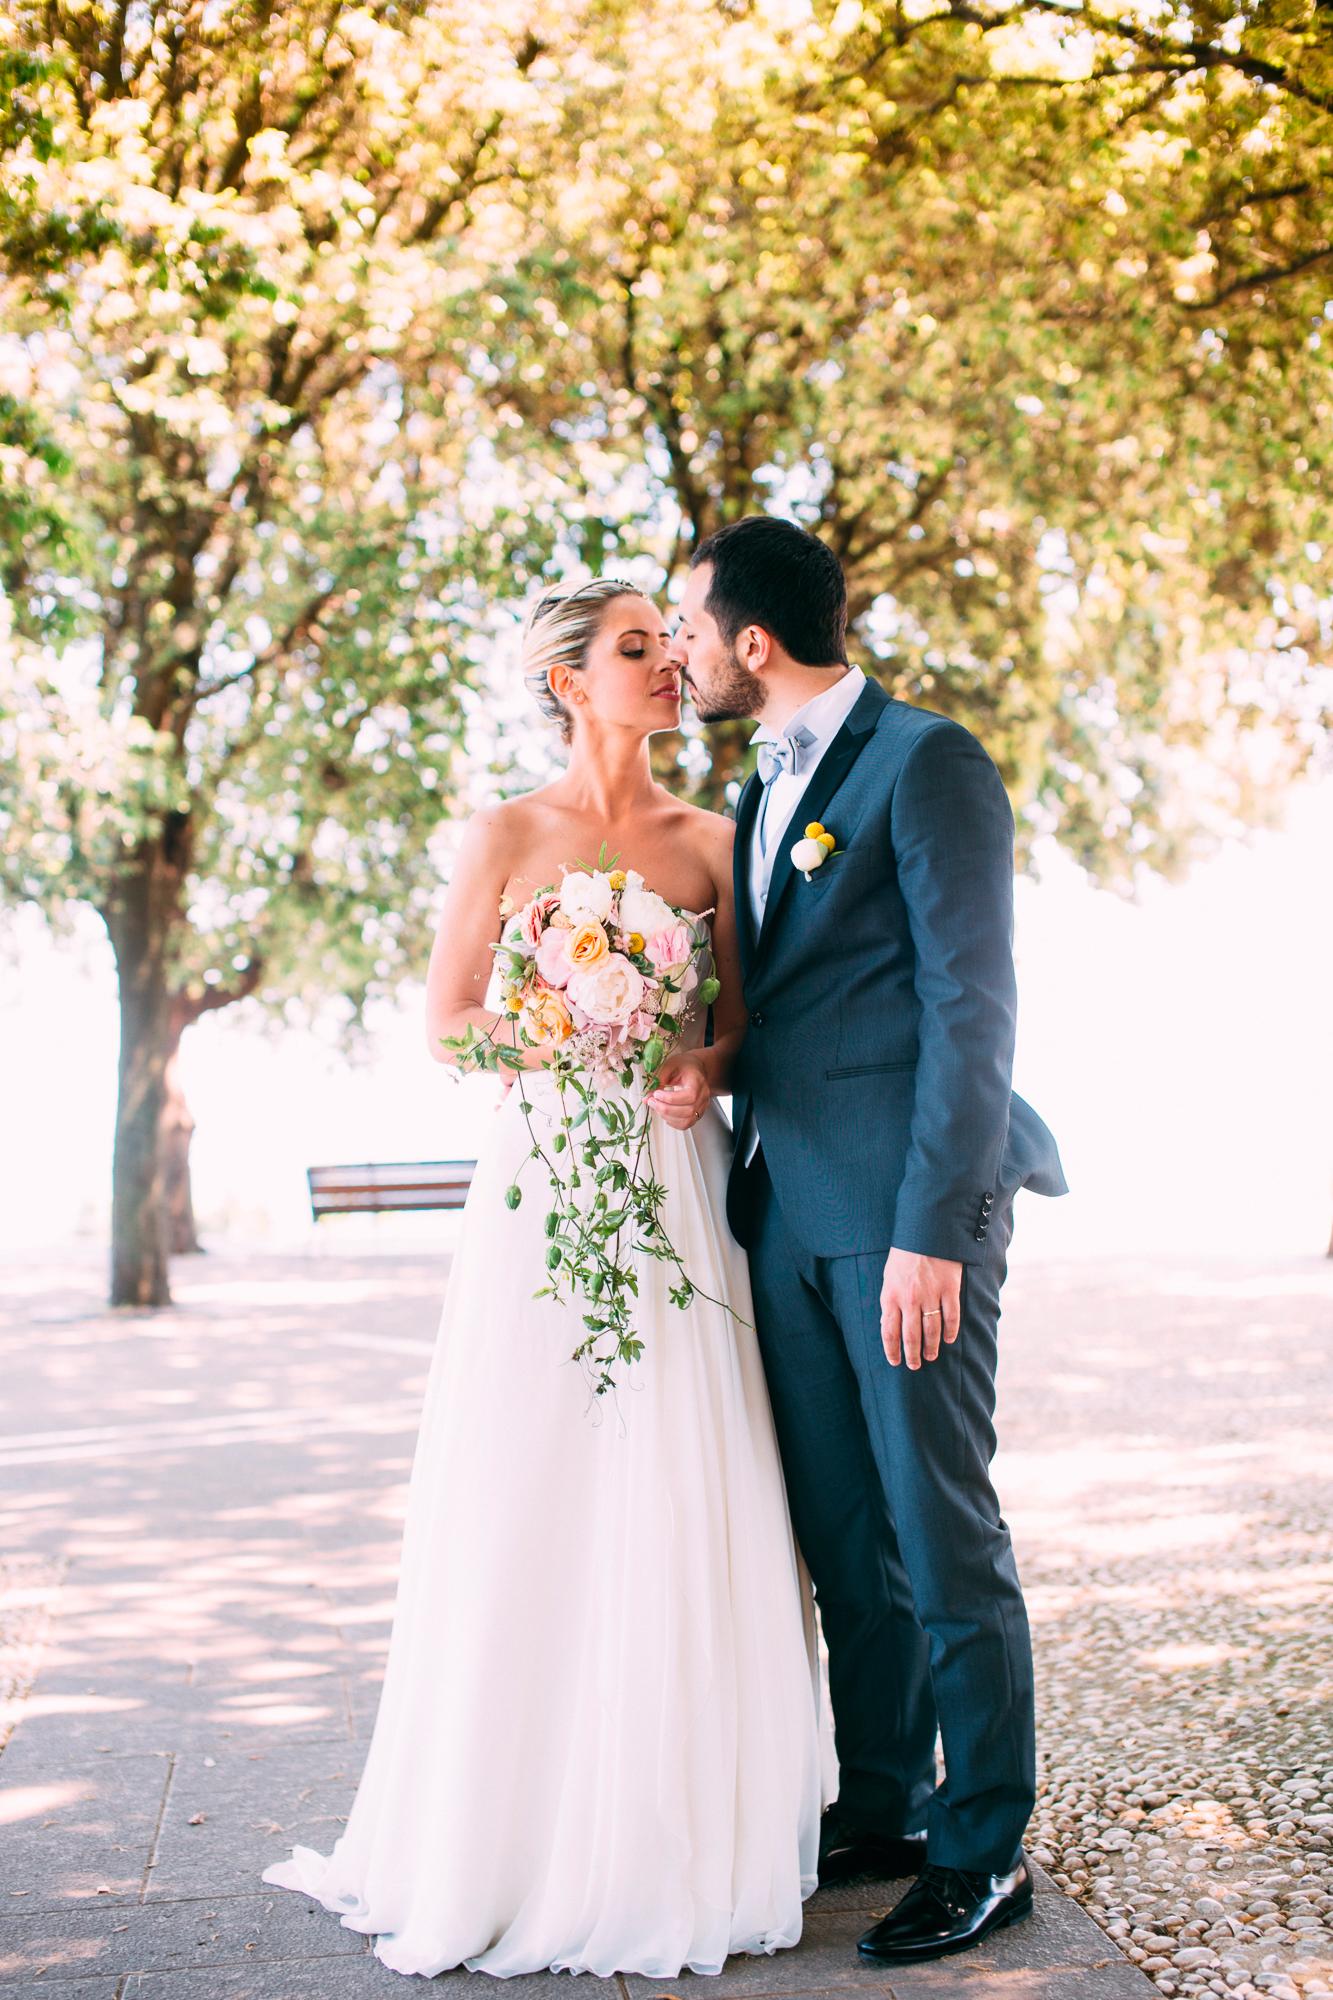 155-bride groom wedding portrait photographer marche conero.jpg